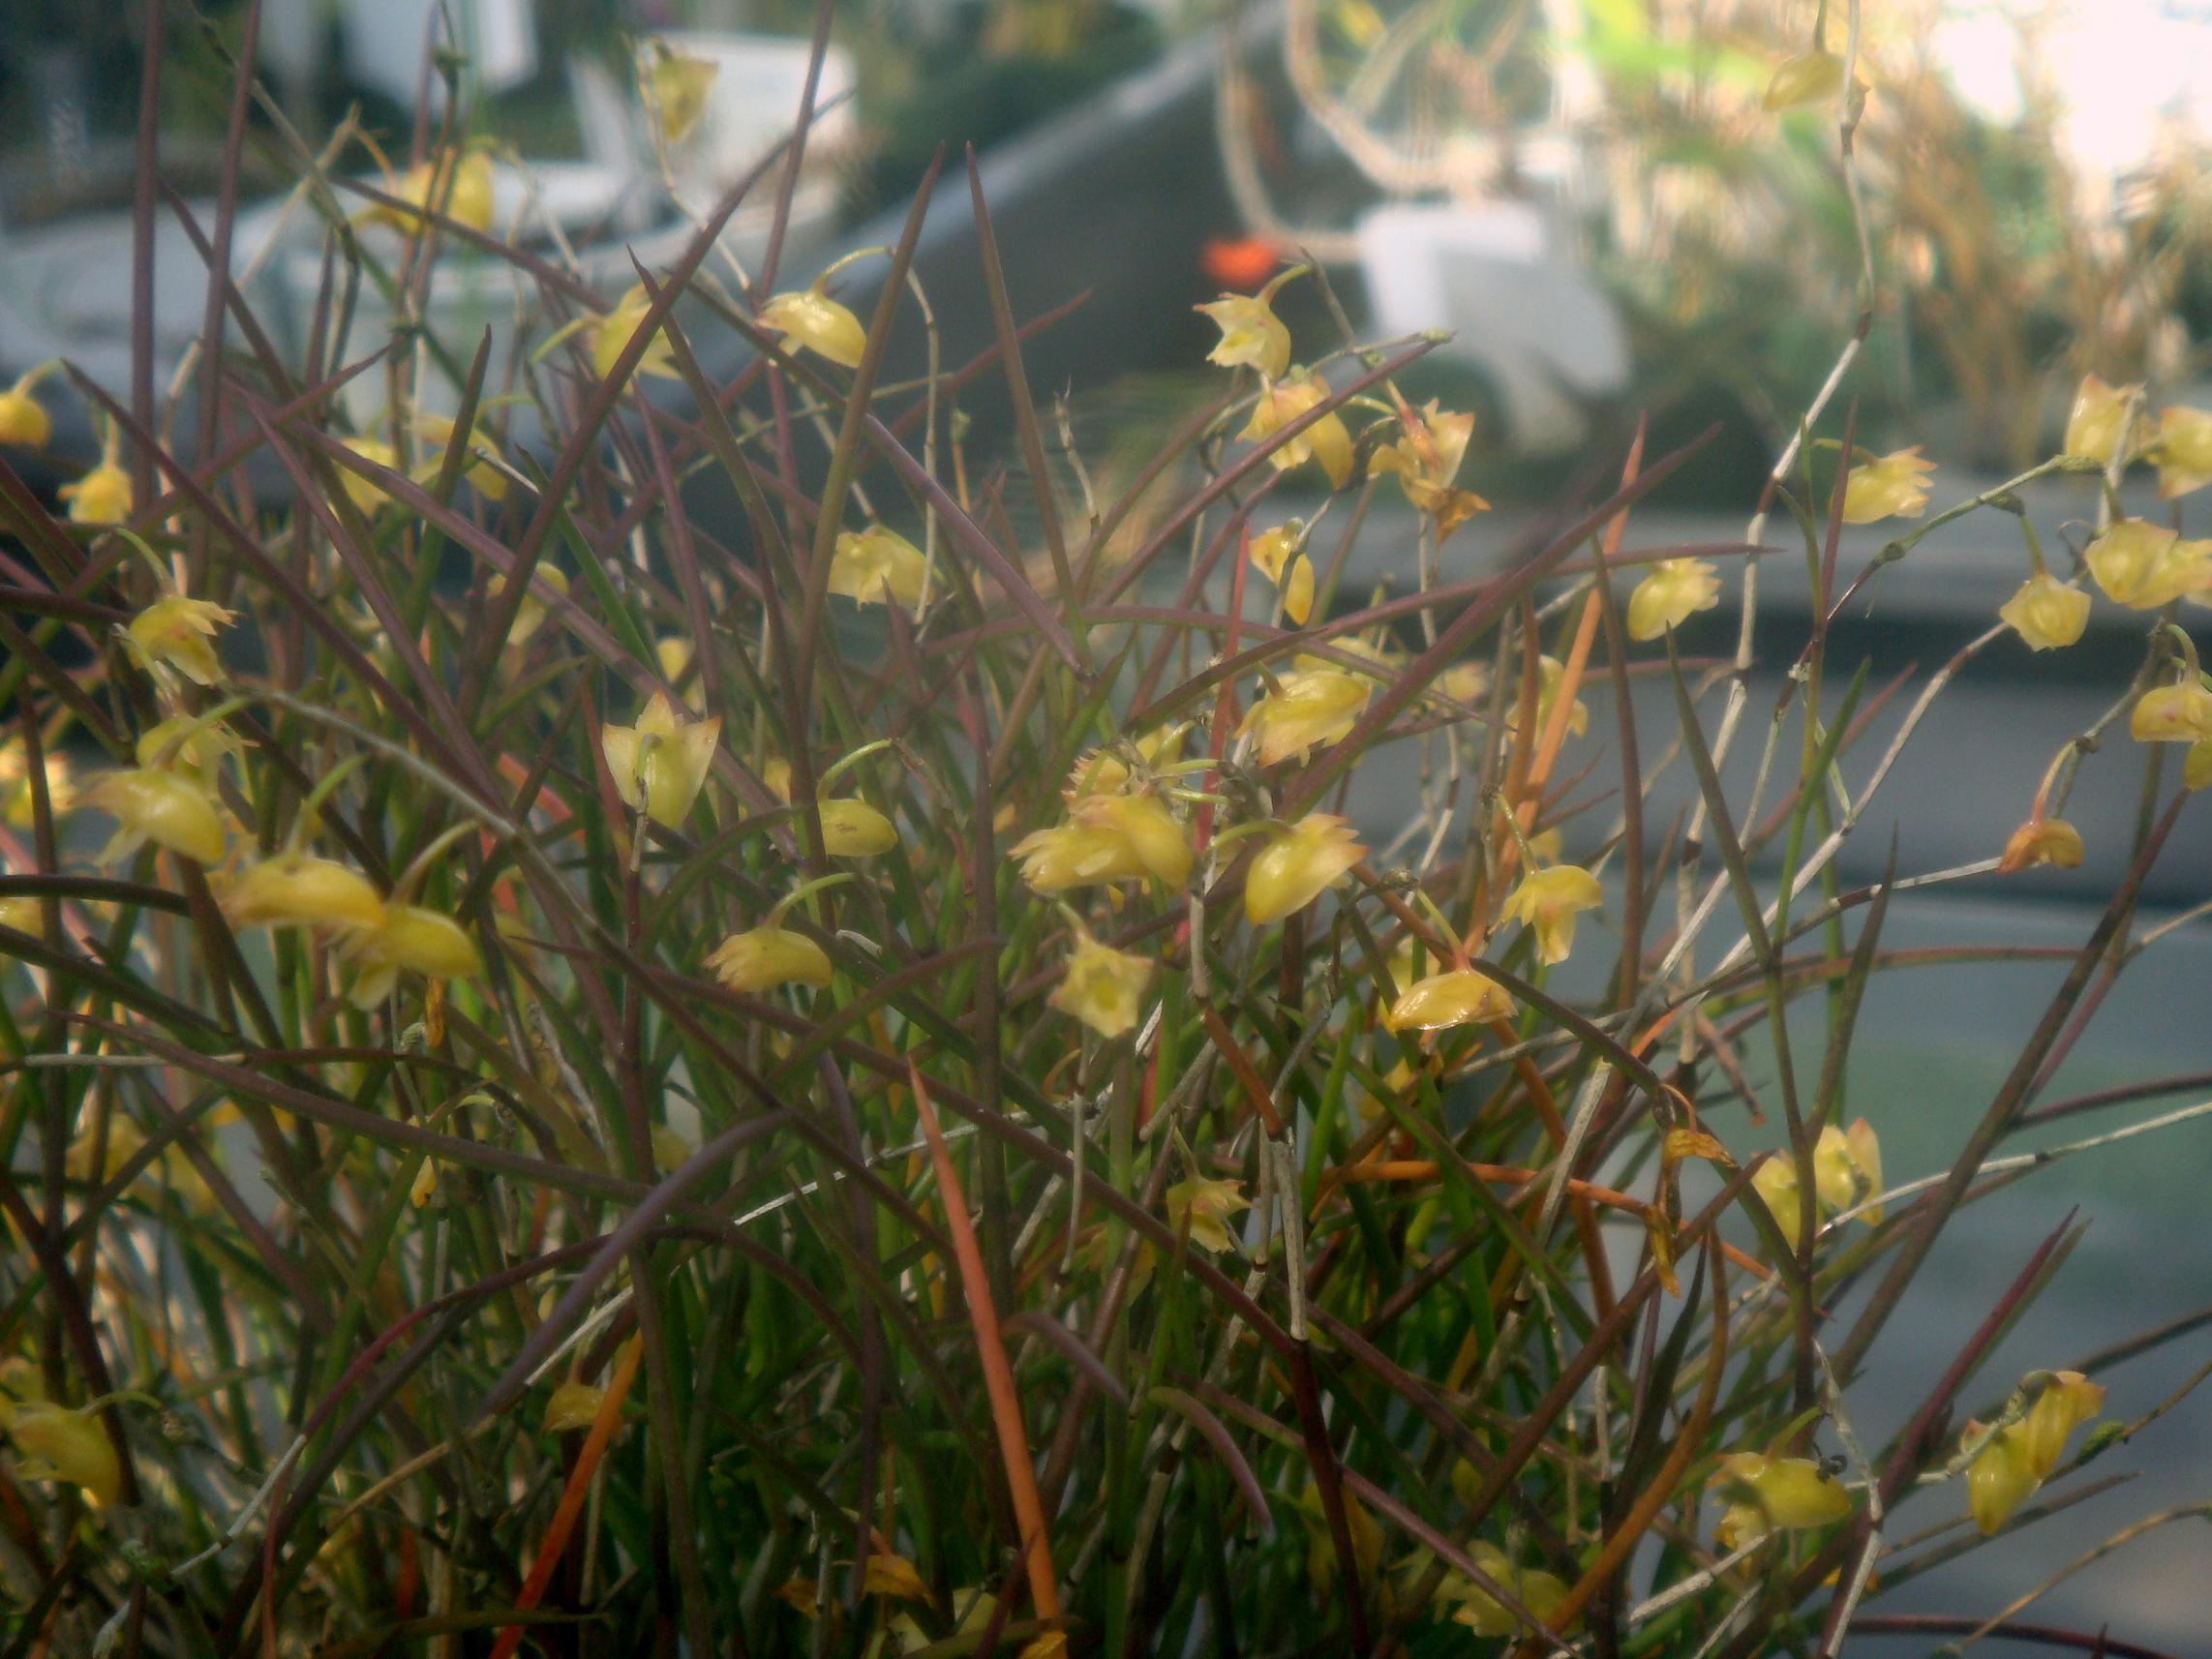 http://orchids.la.coocan.jp/Dendrobium/Dendrobium%20philippinense/DSC00979.JPG